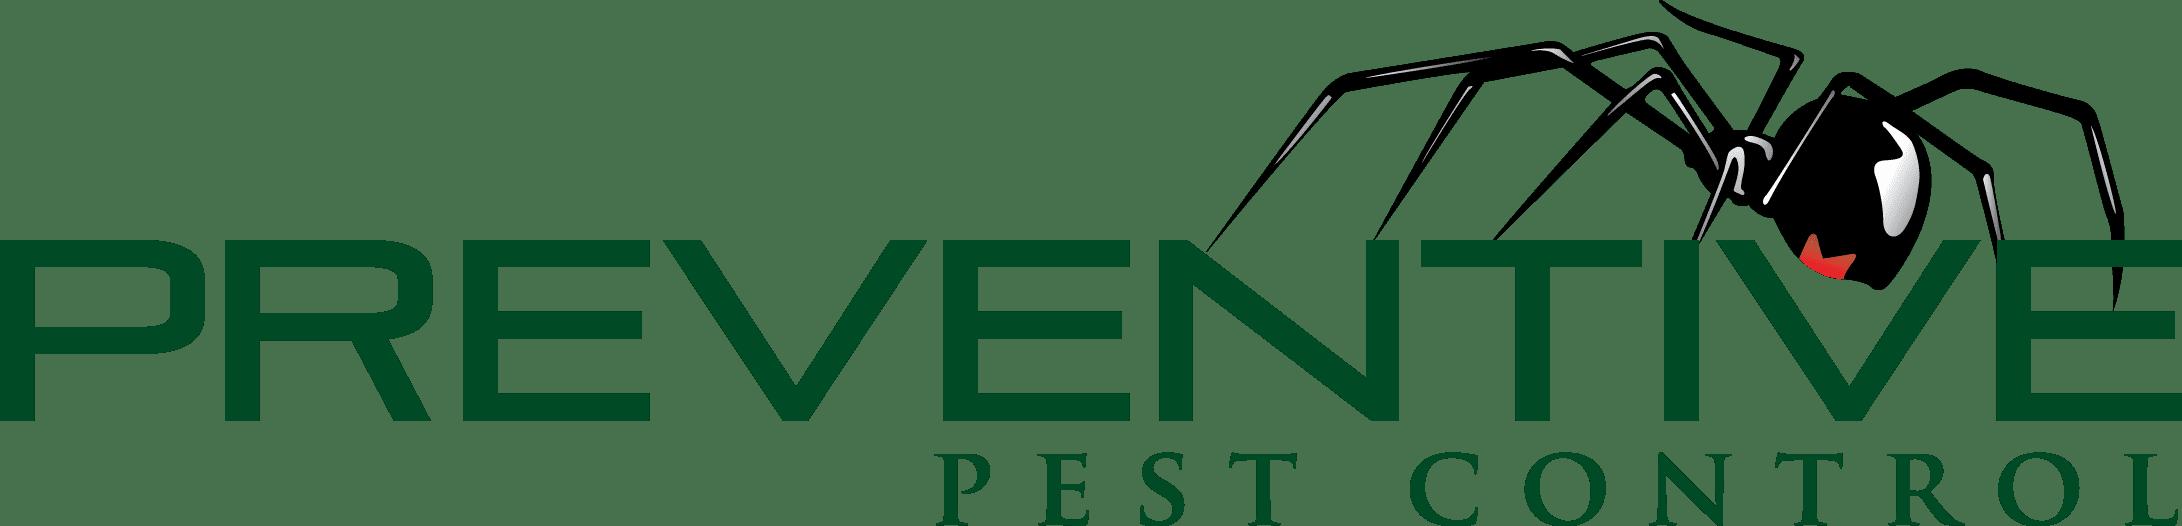 preventivepestcontrol